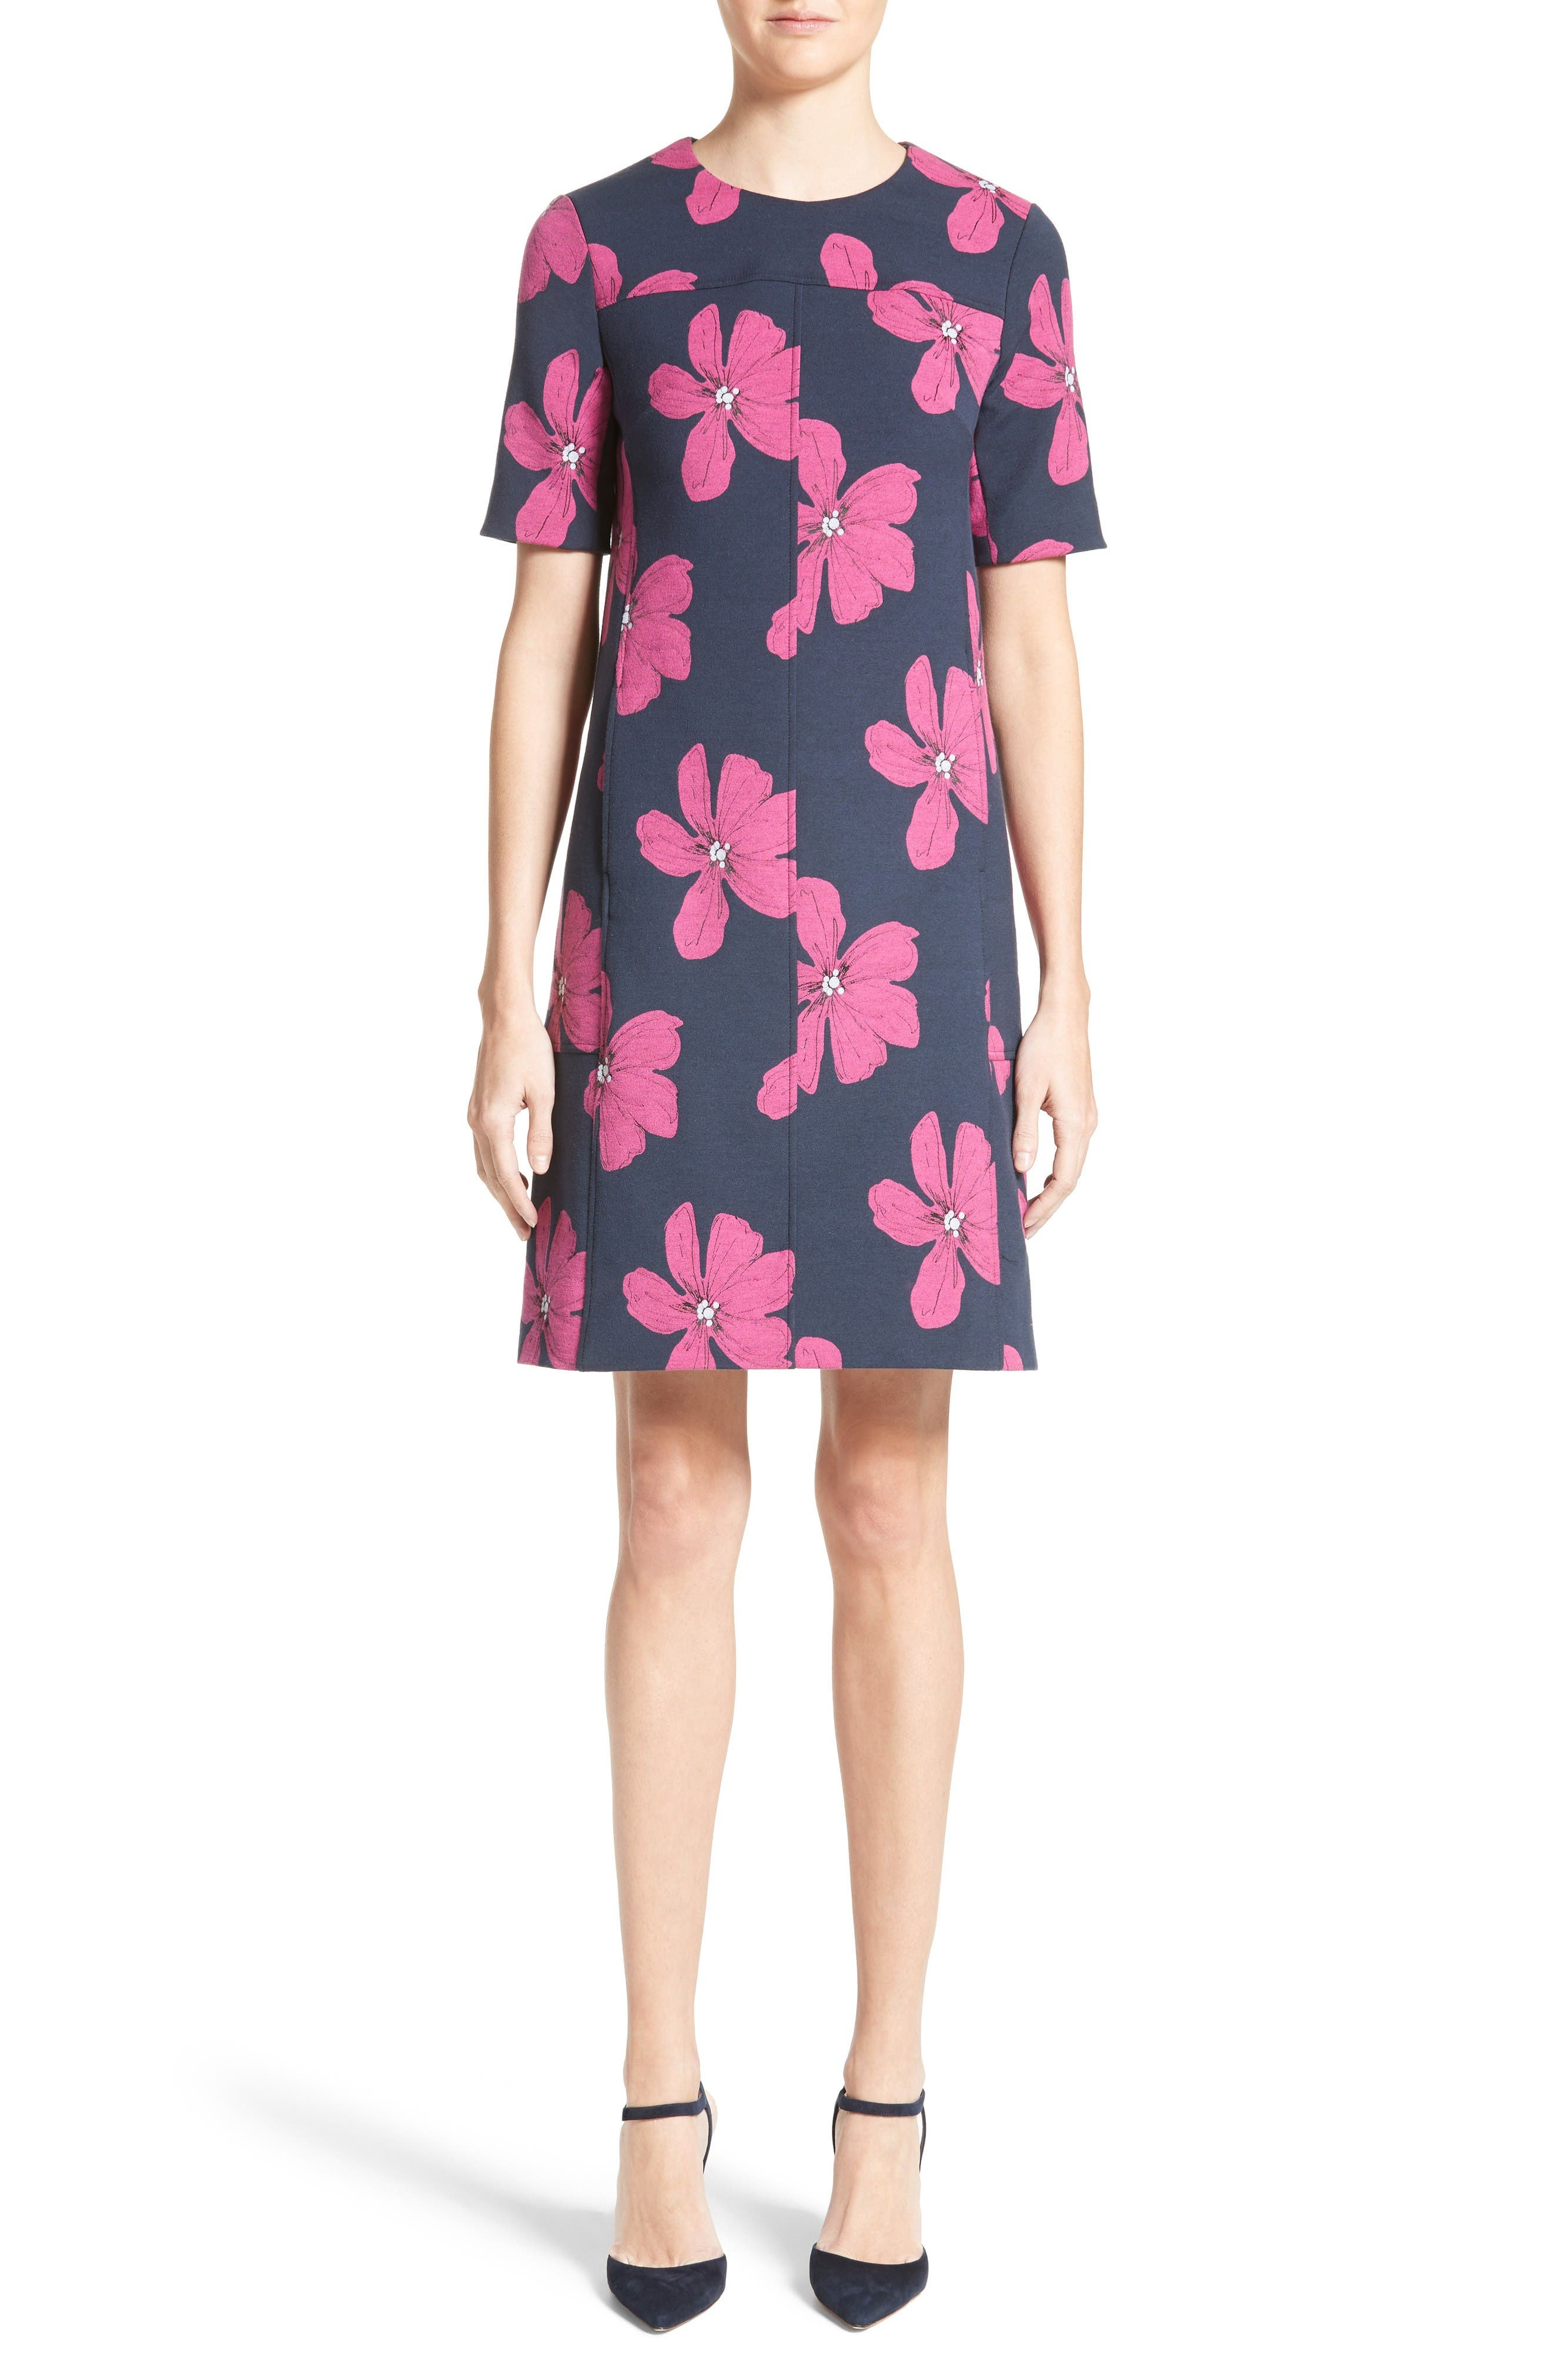 Main Image - Lela Rose Floral Print Stretch Jacquard Tunic Dress